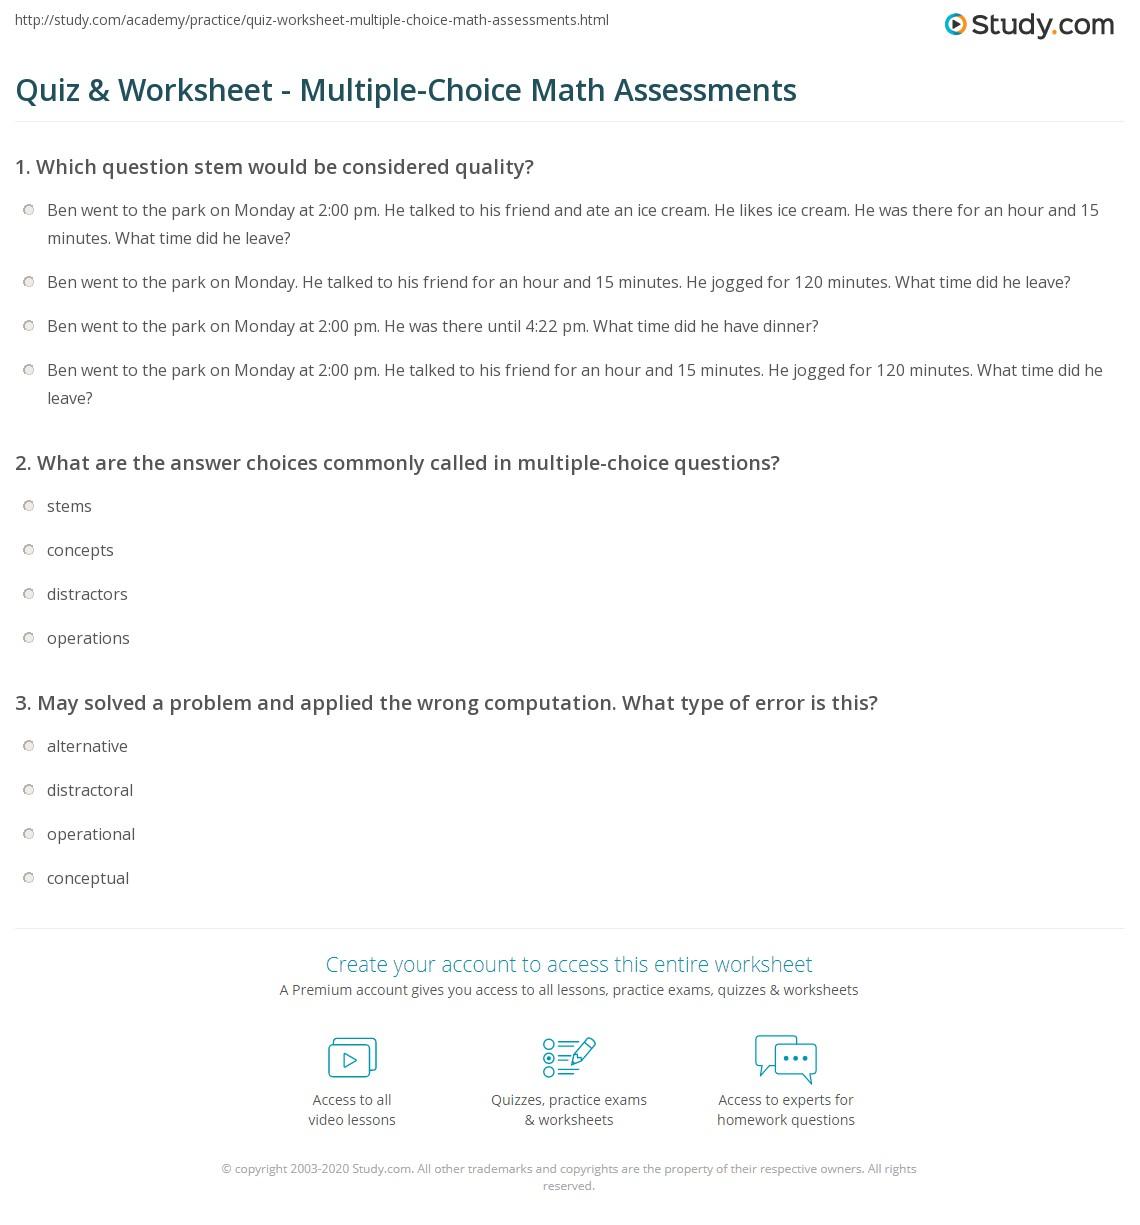 Worksheets Multiple Choice Math Worksheets quiz worksheet multiple choice math assessments study com print developing for worksheet